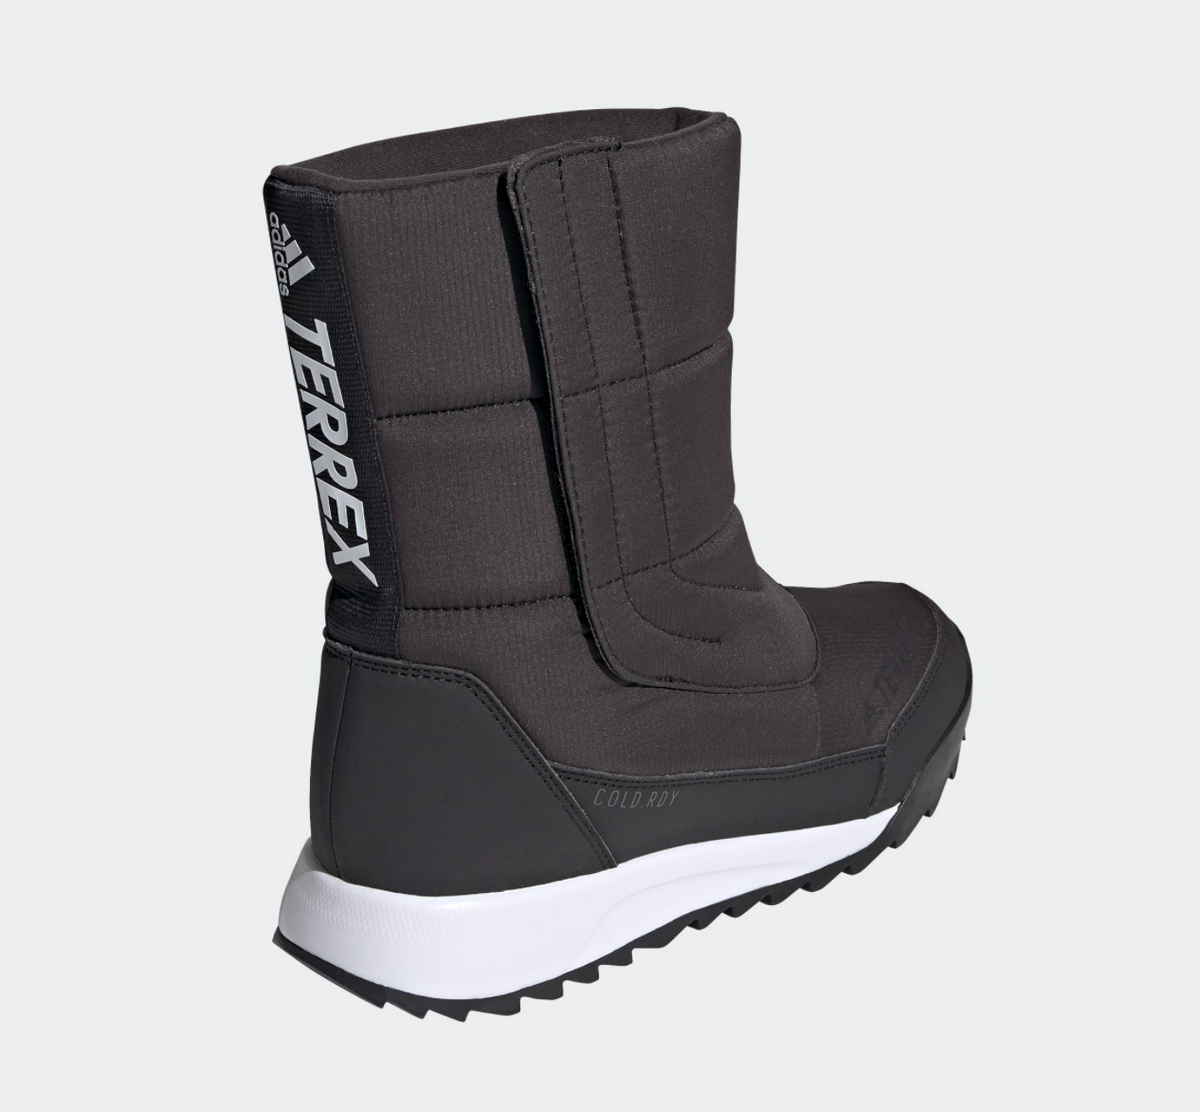 Sort Adidas Terrex Choleah Boot C.Rdy